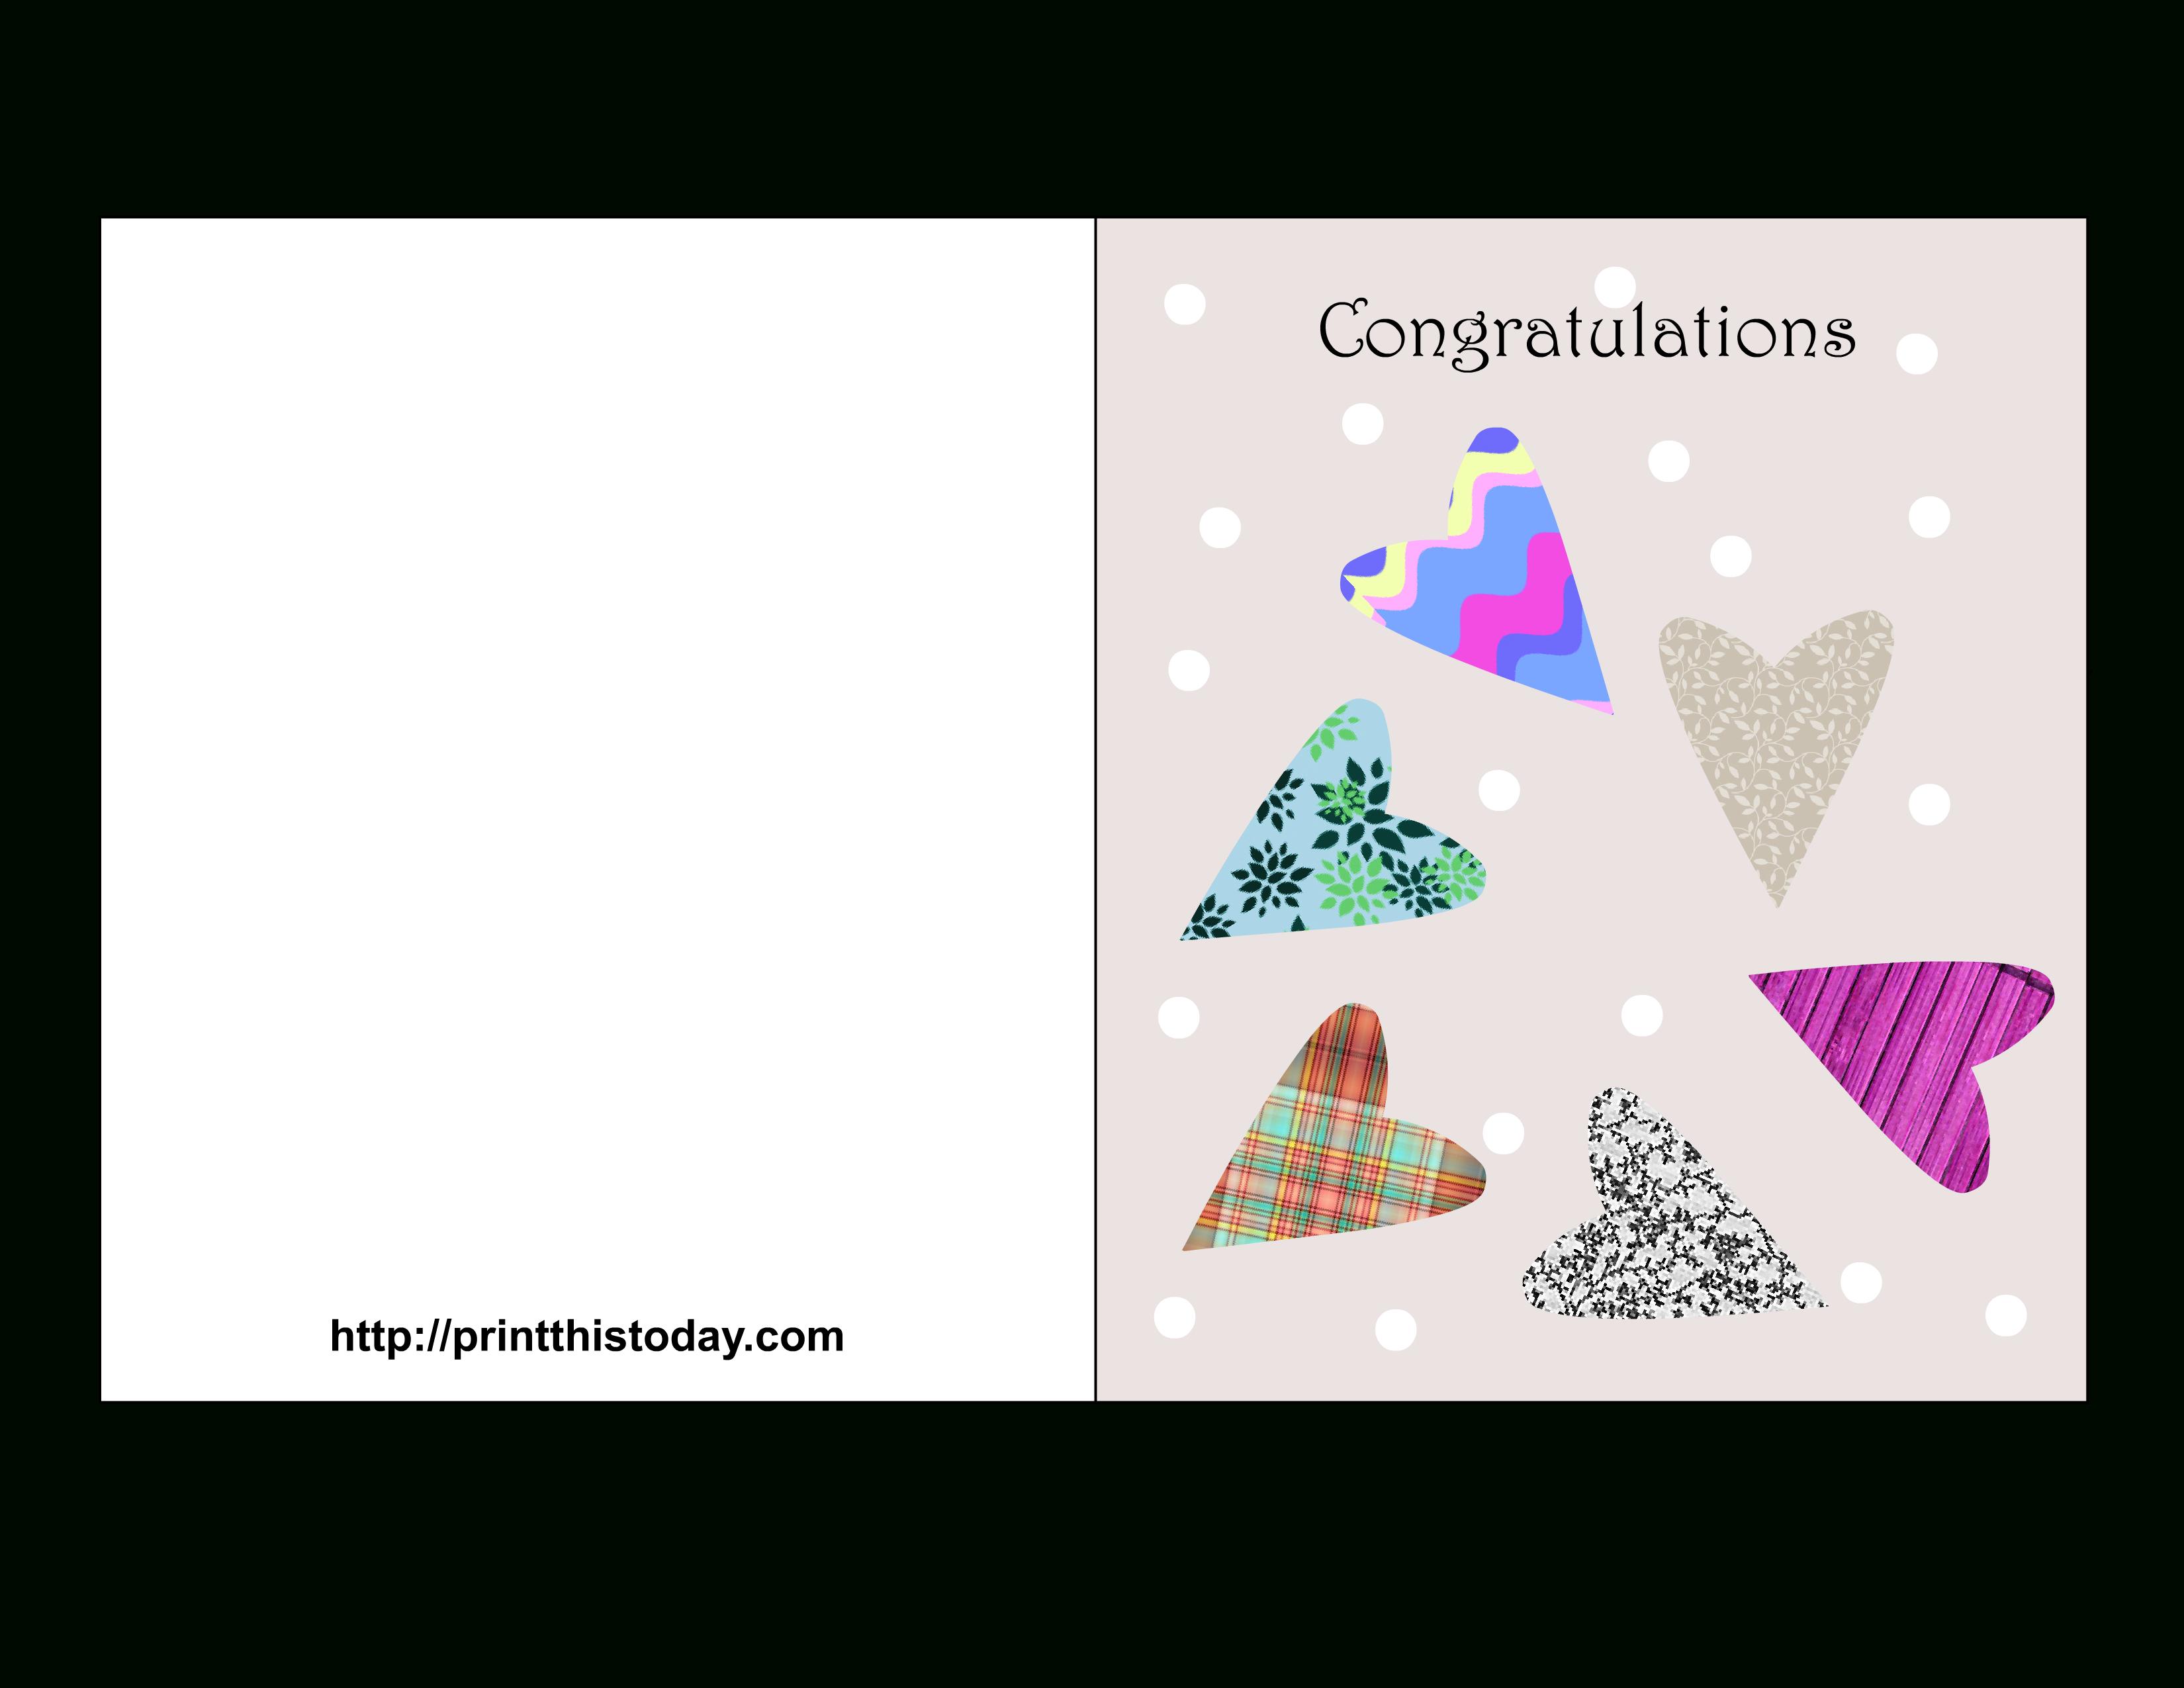 Free Printable Wedding Congratulations Cards - Free Printable Congratulations Cards